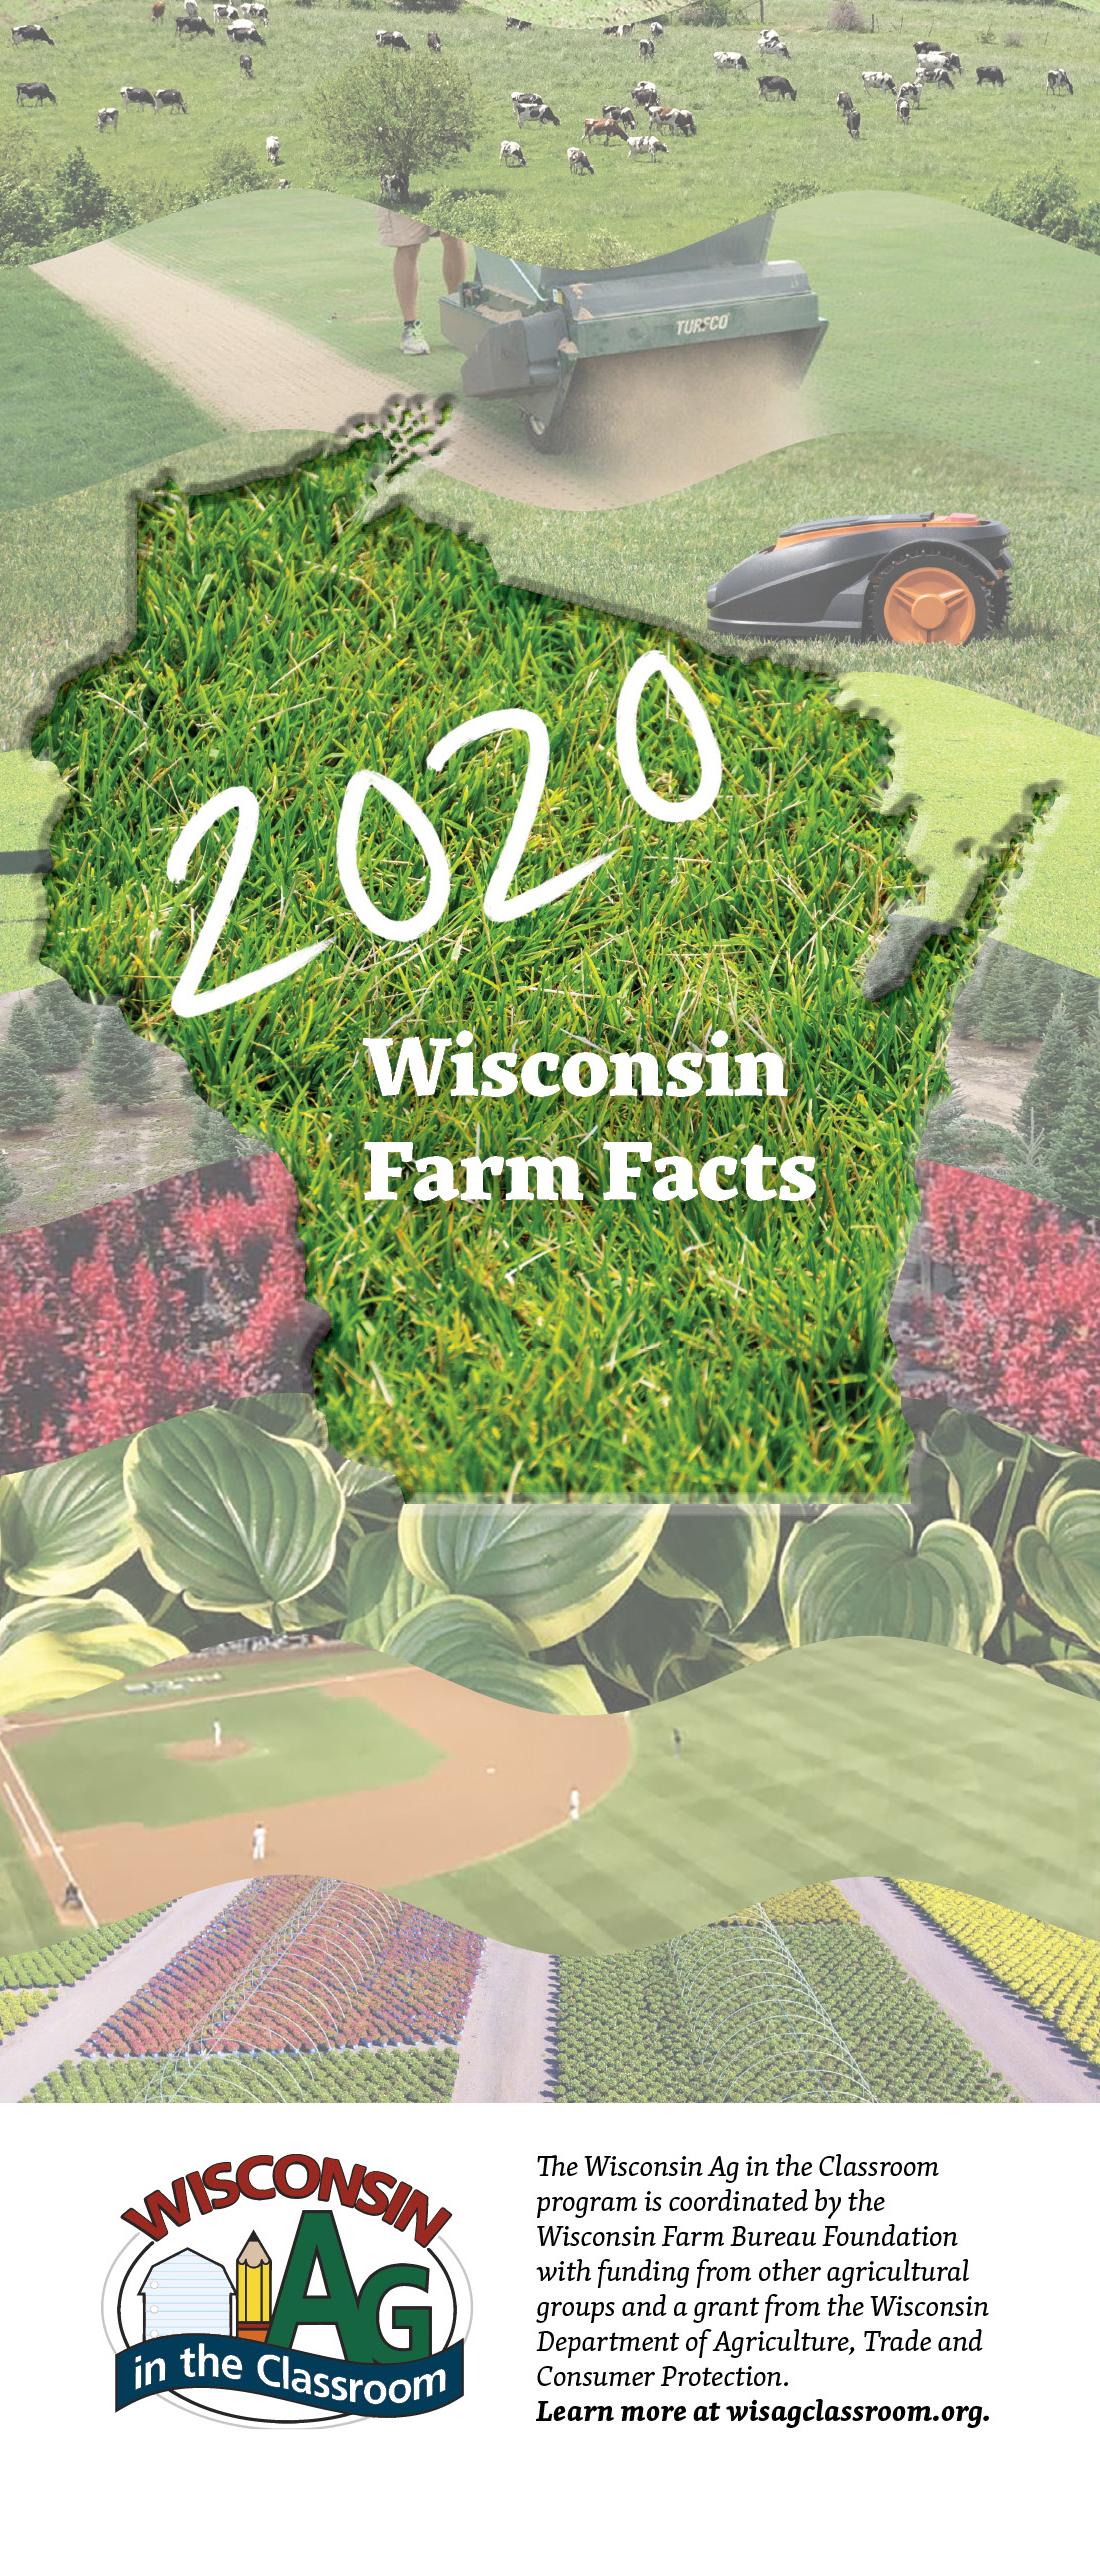 Wisconsin Farm Facts 2020